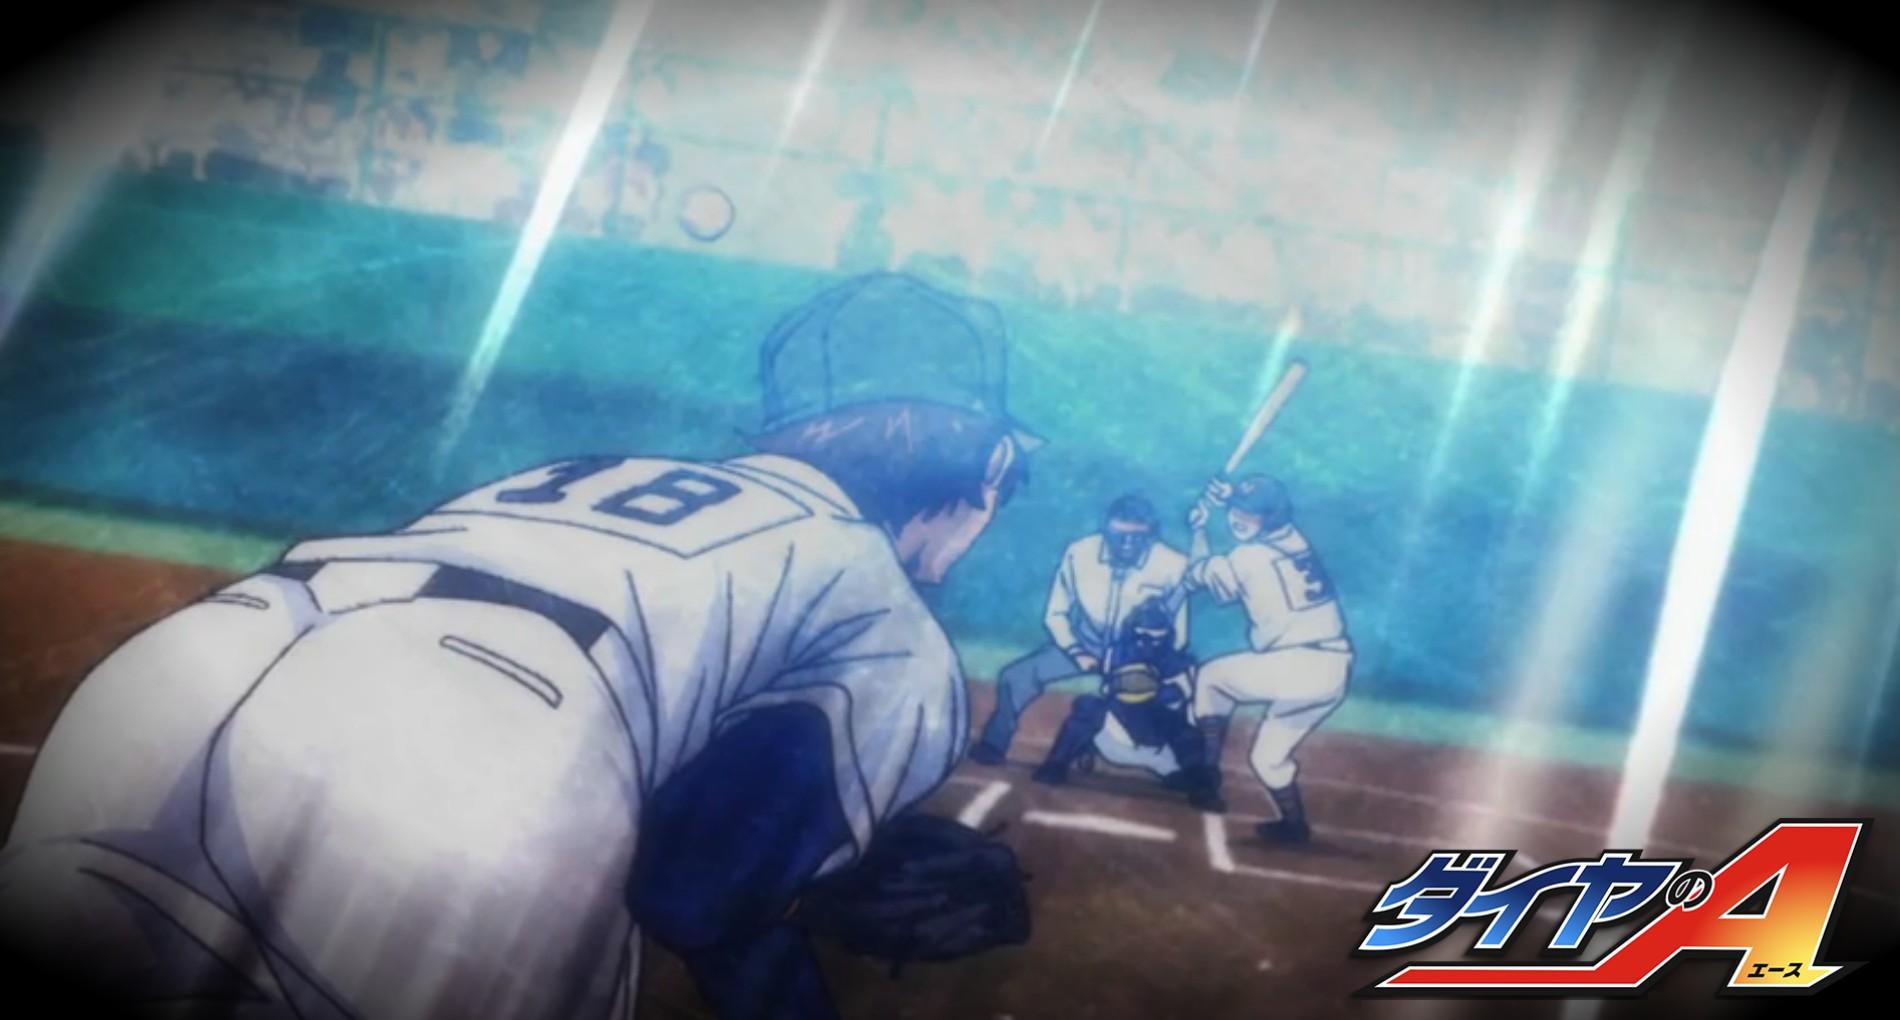 Wallpaper 1900x1020 Px Ace Of Diamond Anime Baseball